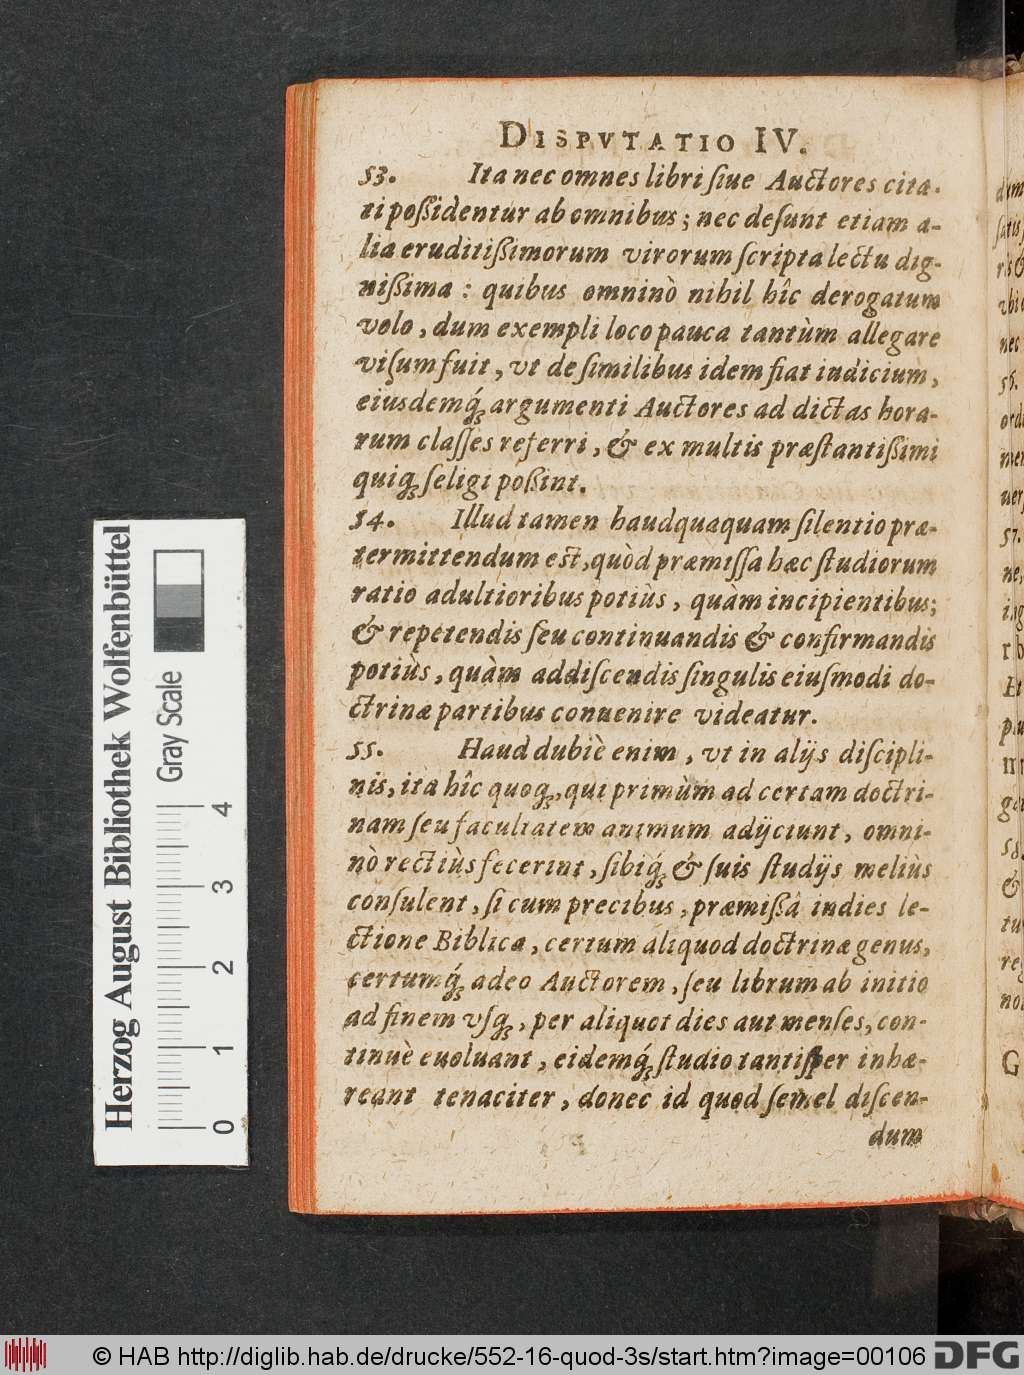 http://diglib.hab.de/drucke/552-16-quod-3s/00106.jpg